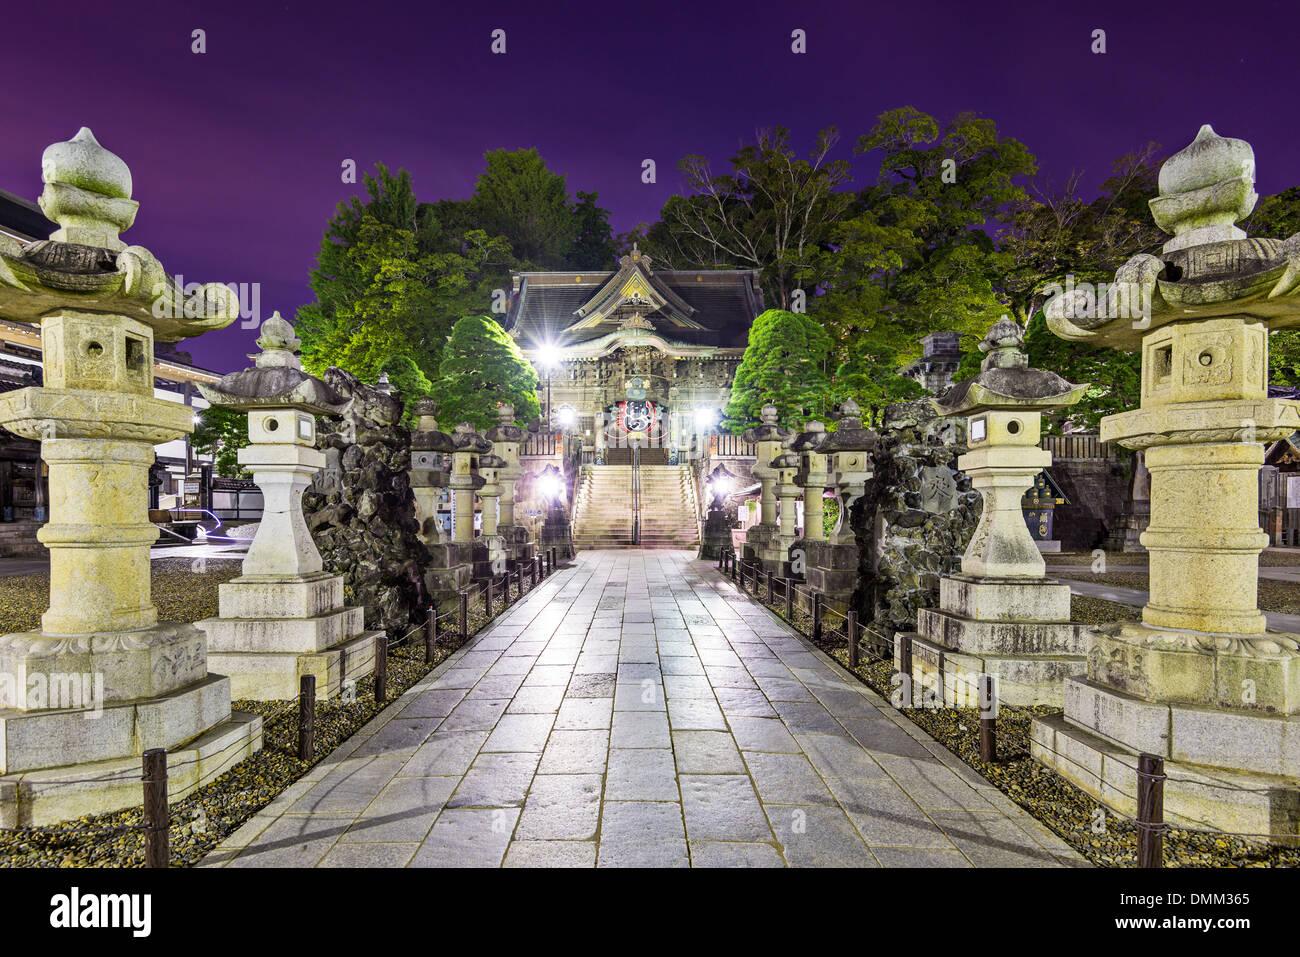 Narita Shrine in Narita, Japan. - Stock Image